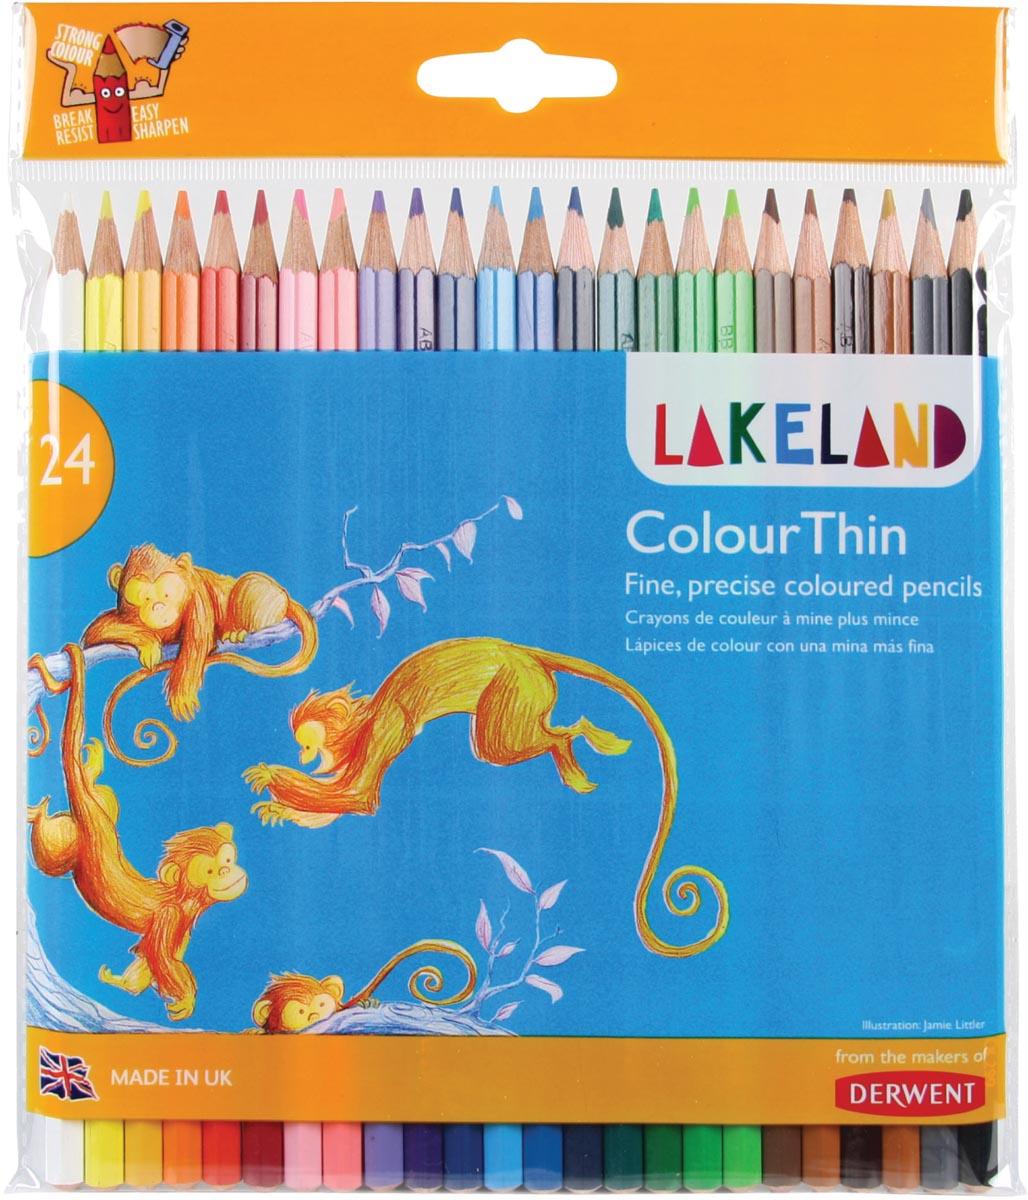 Lakeland kleurpotlood Colourthin, blister van 24 stuks in geassorteerde kleuren